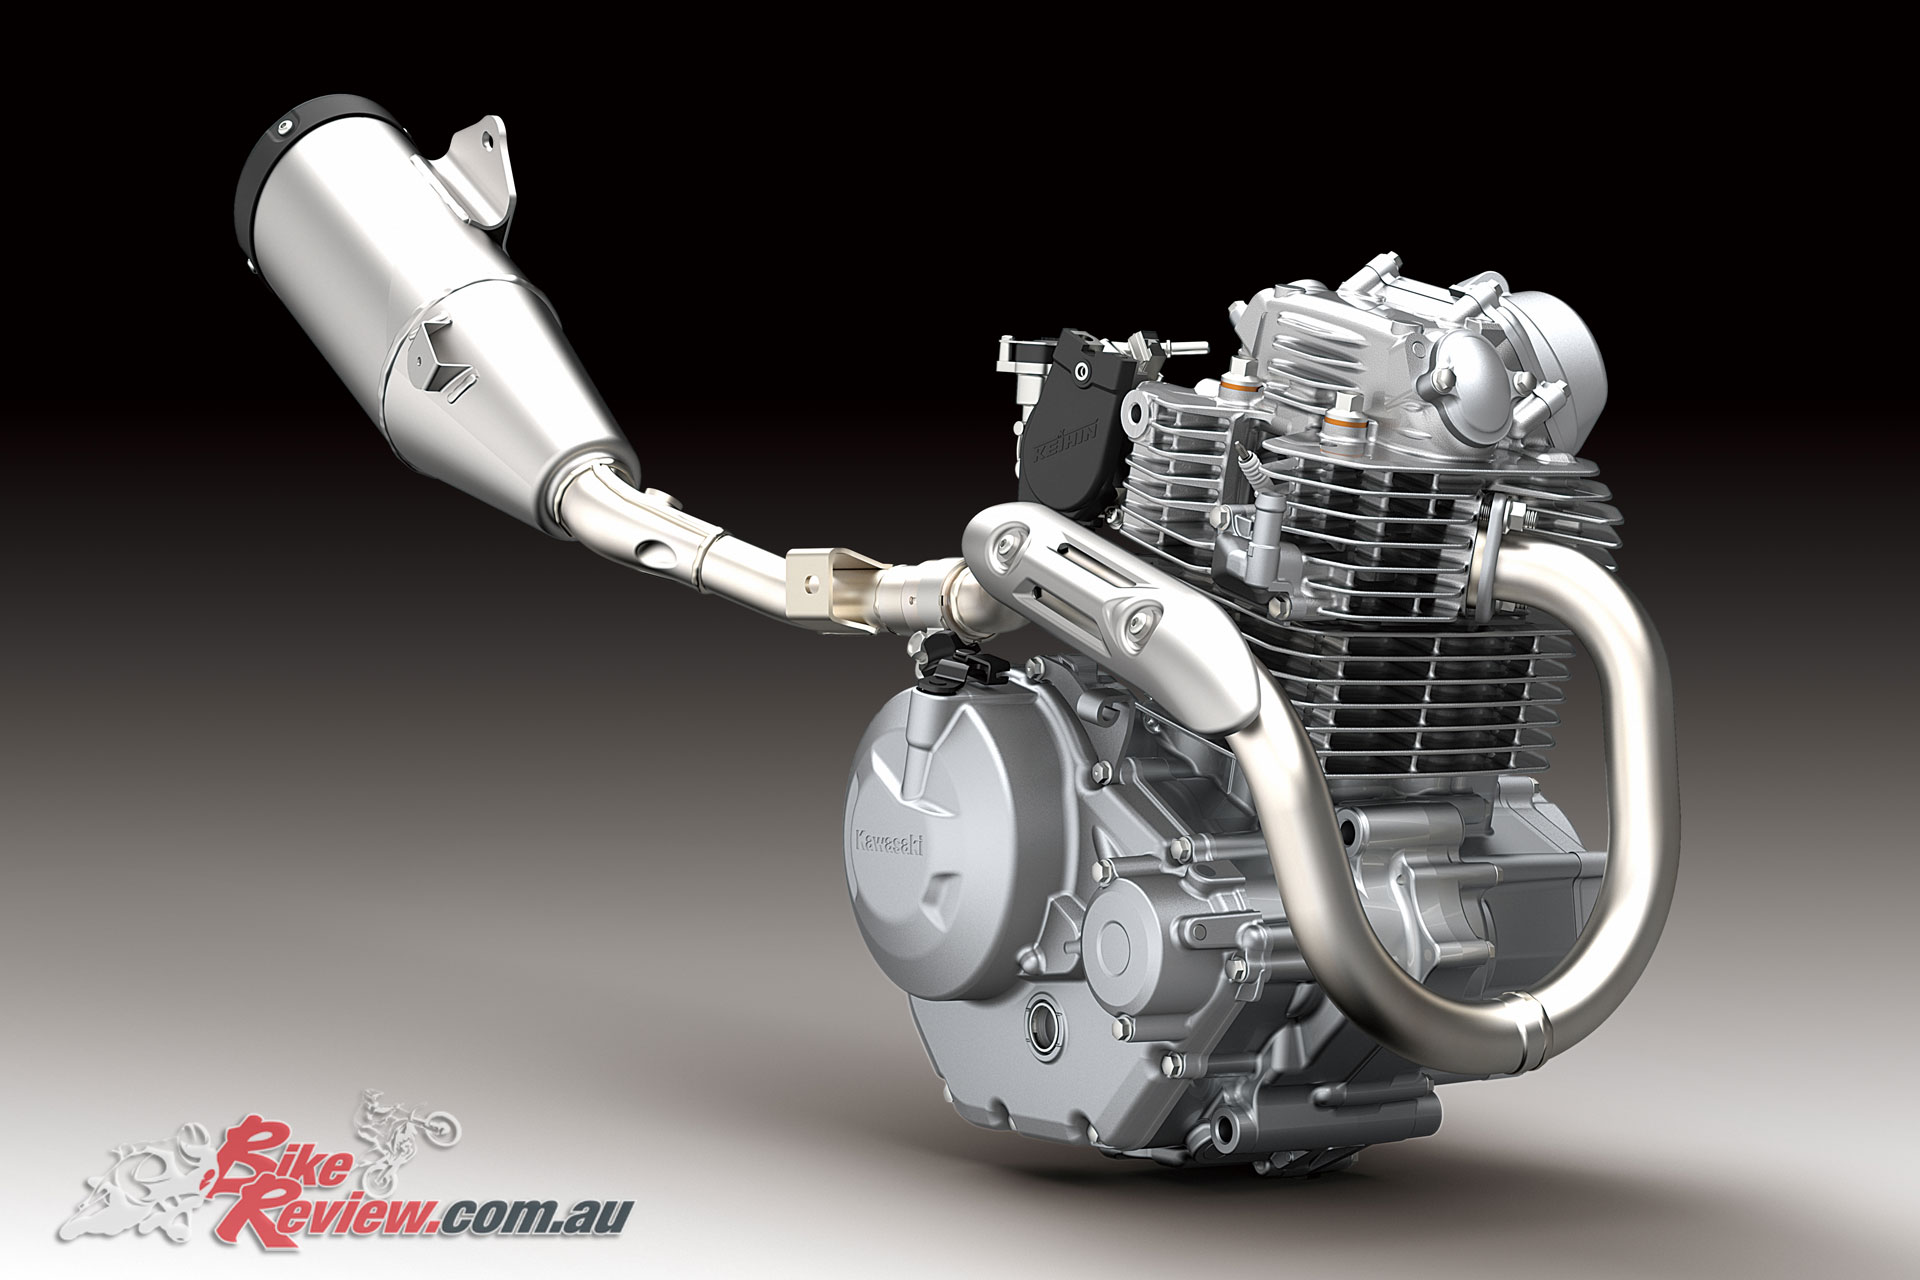 2020 Kawasaki KLX230R single-cylinder air-cooled engine